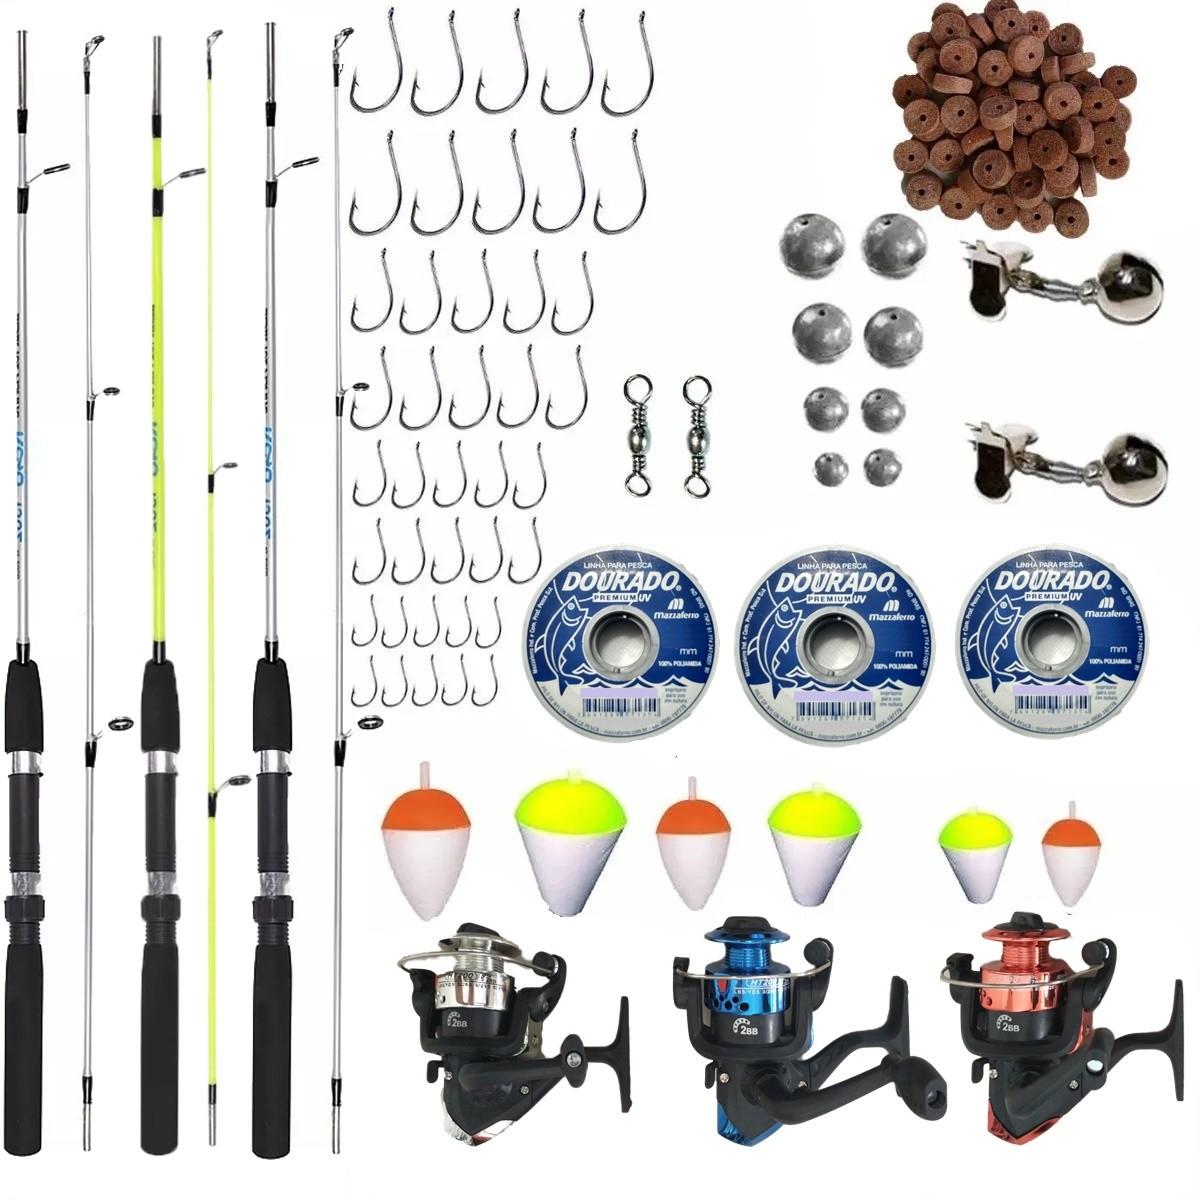 Kit Pesca Completo  6kg 3 Vara 1,35m 3 Molinete e Acessorios